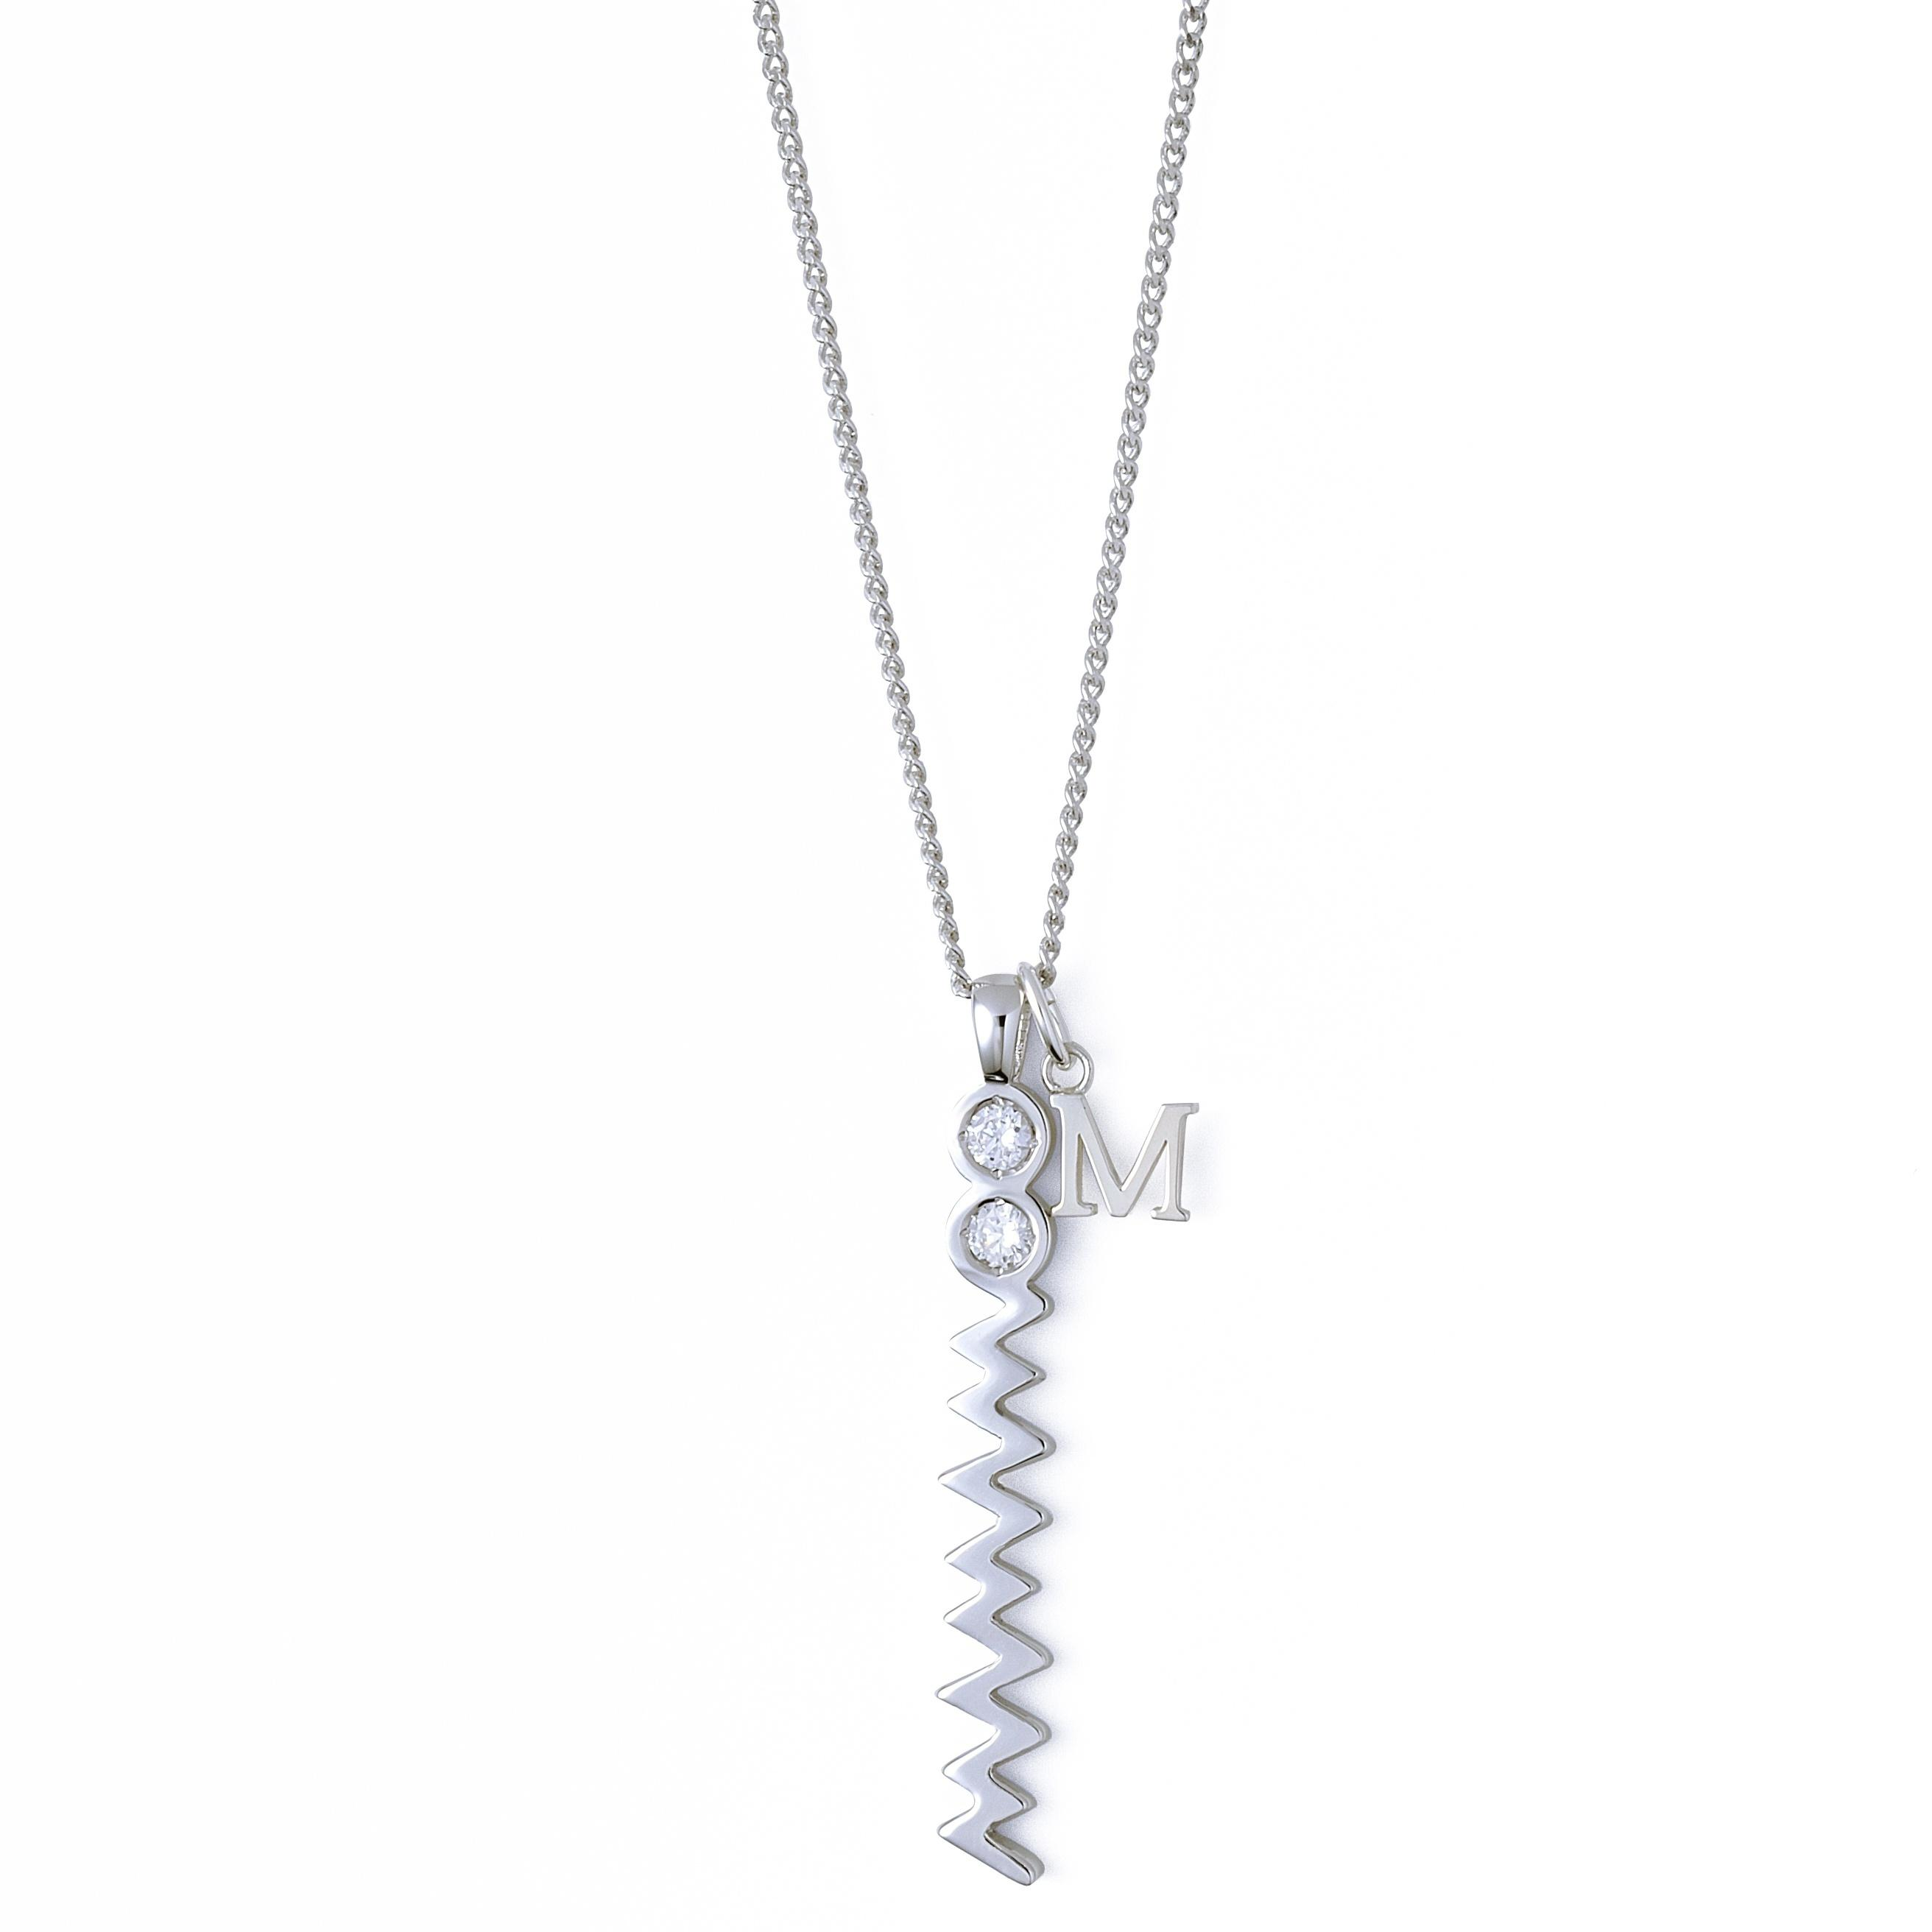 mmm_neck_silver_M